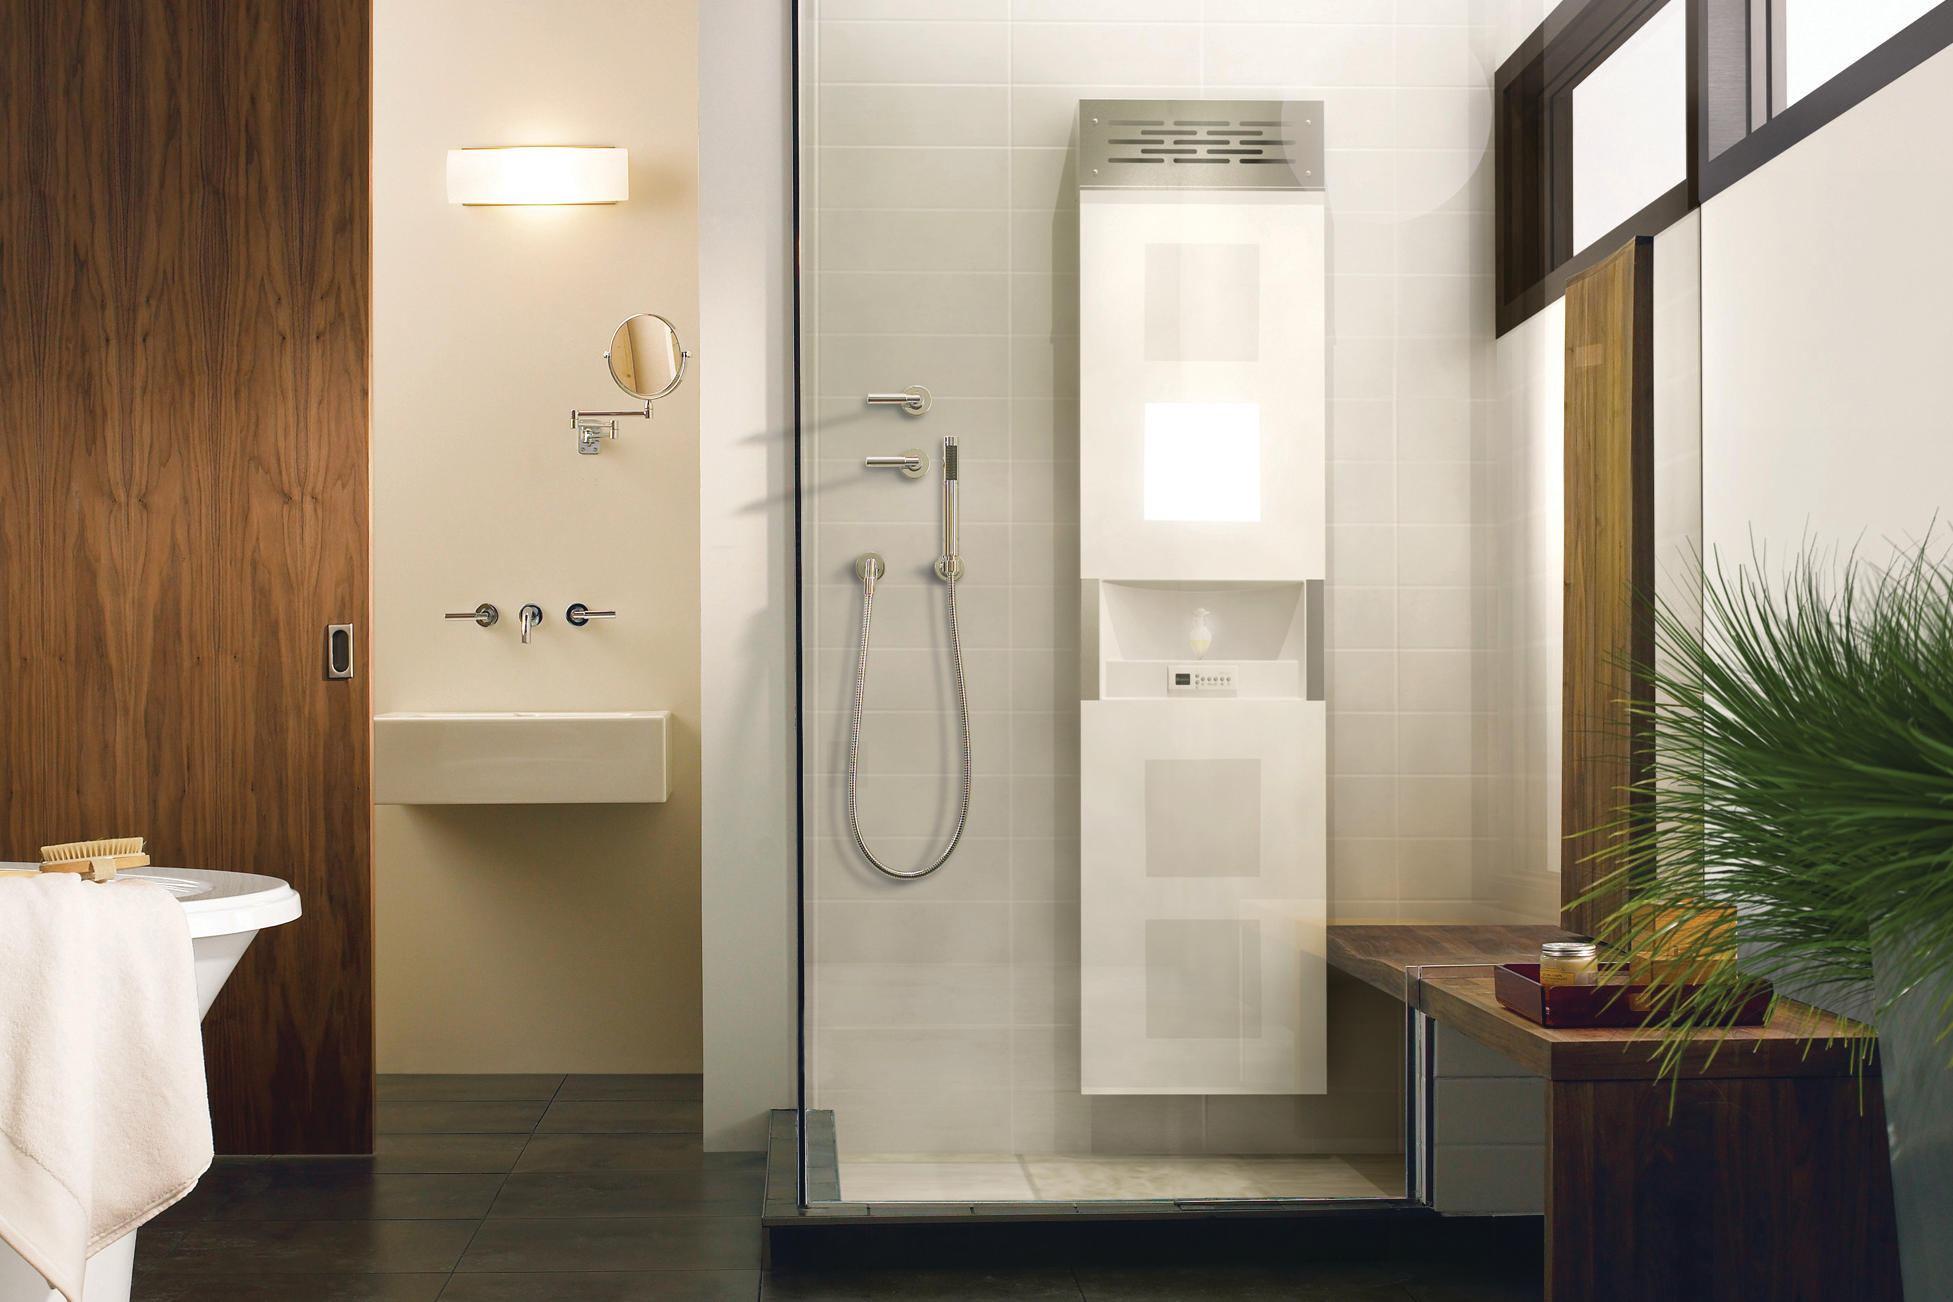 Bainultra S Vedana Builder Magazine Products Bath